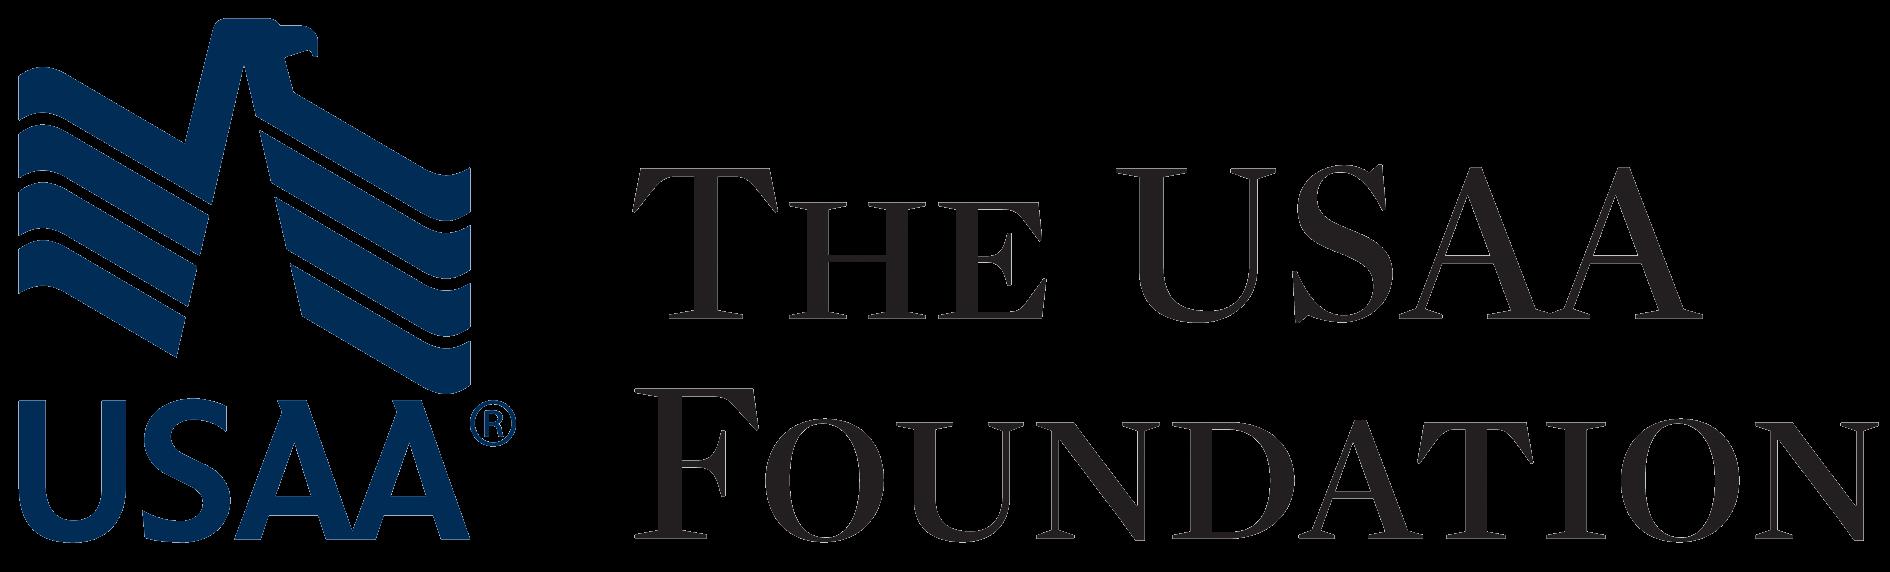 USAA_Foundation